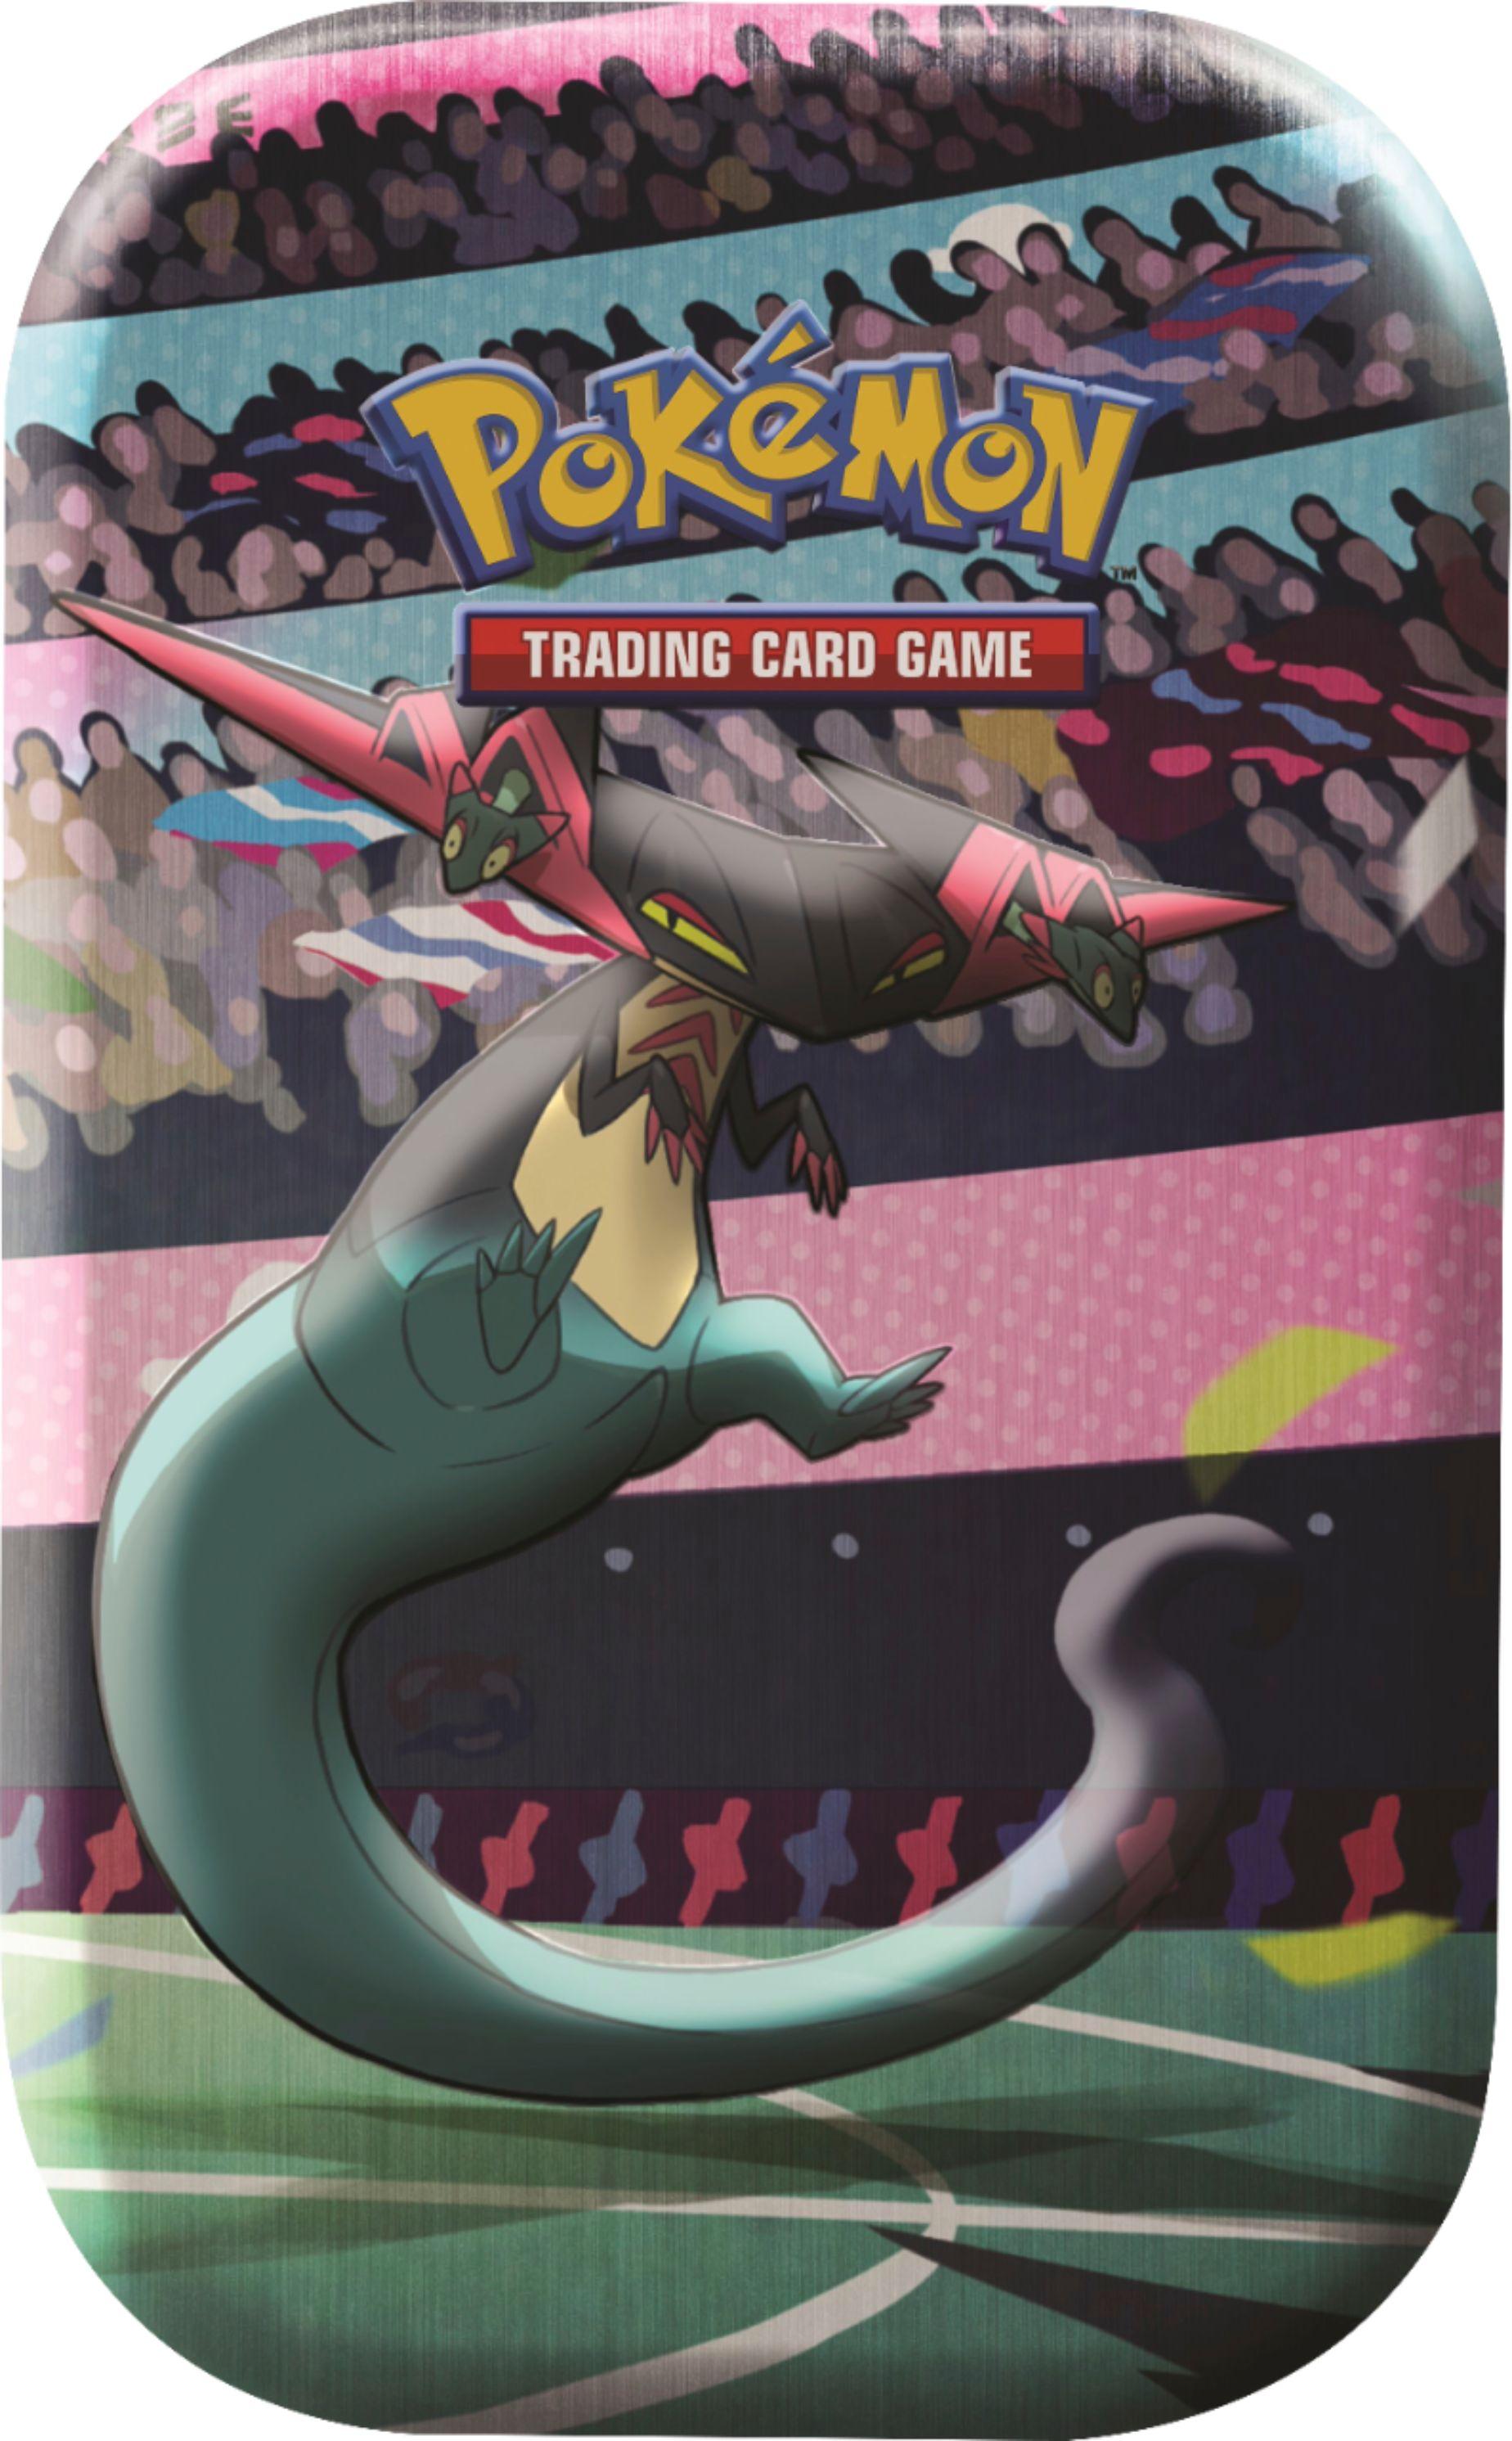 Pokémon TCG: Galar Power Mini Tin 210-82740 - Best Buy $8.99